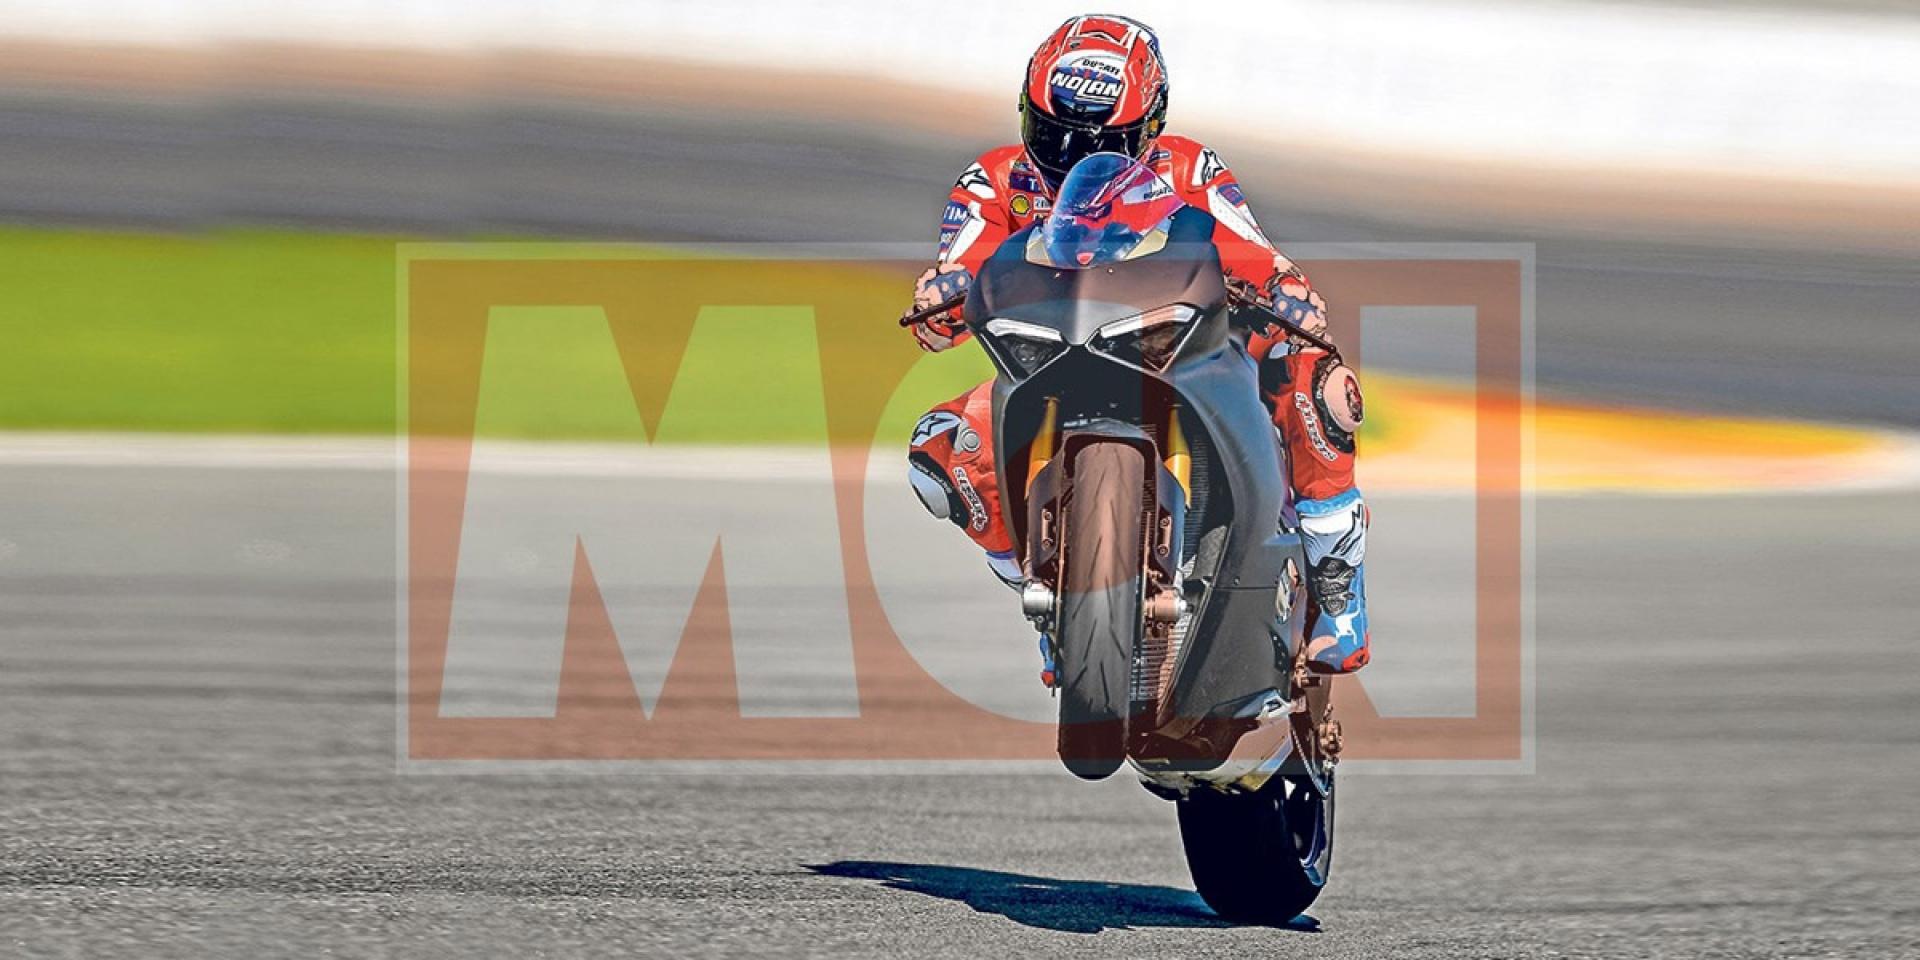 Casey Stoner賽道測試Ducati Panigale V4,驚見新一代Pirelli Supercorsa!